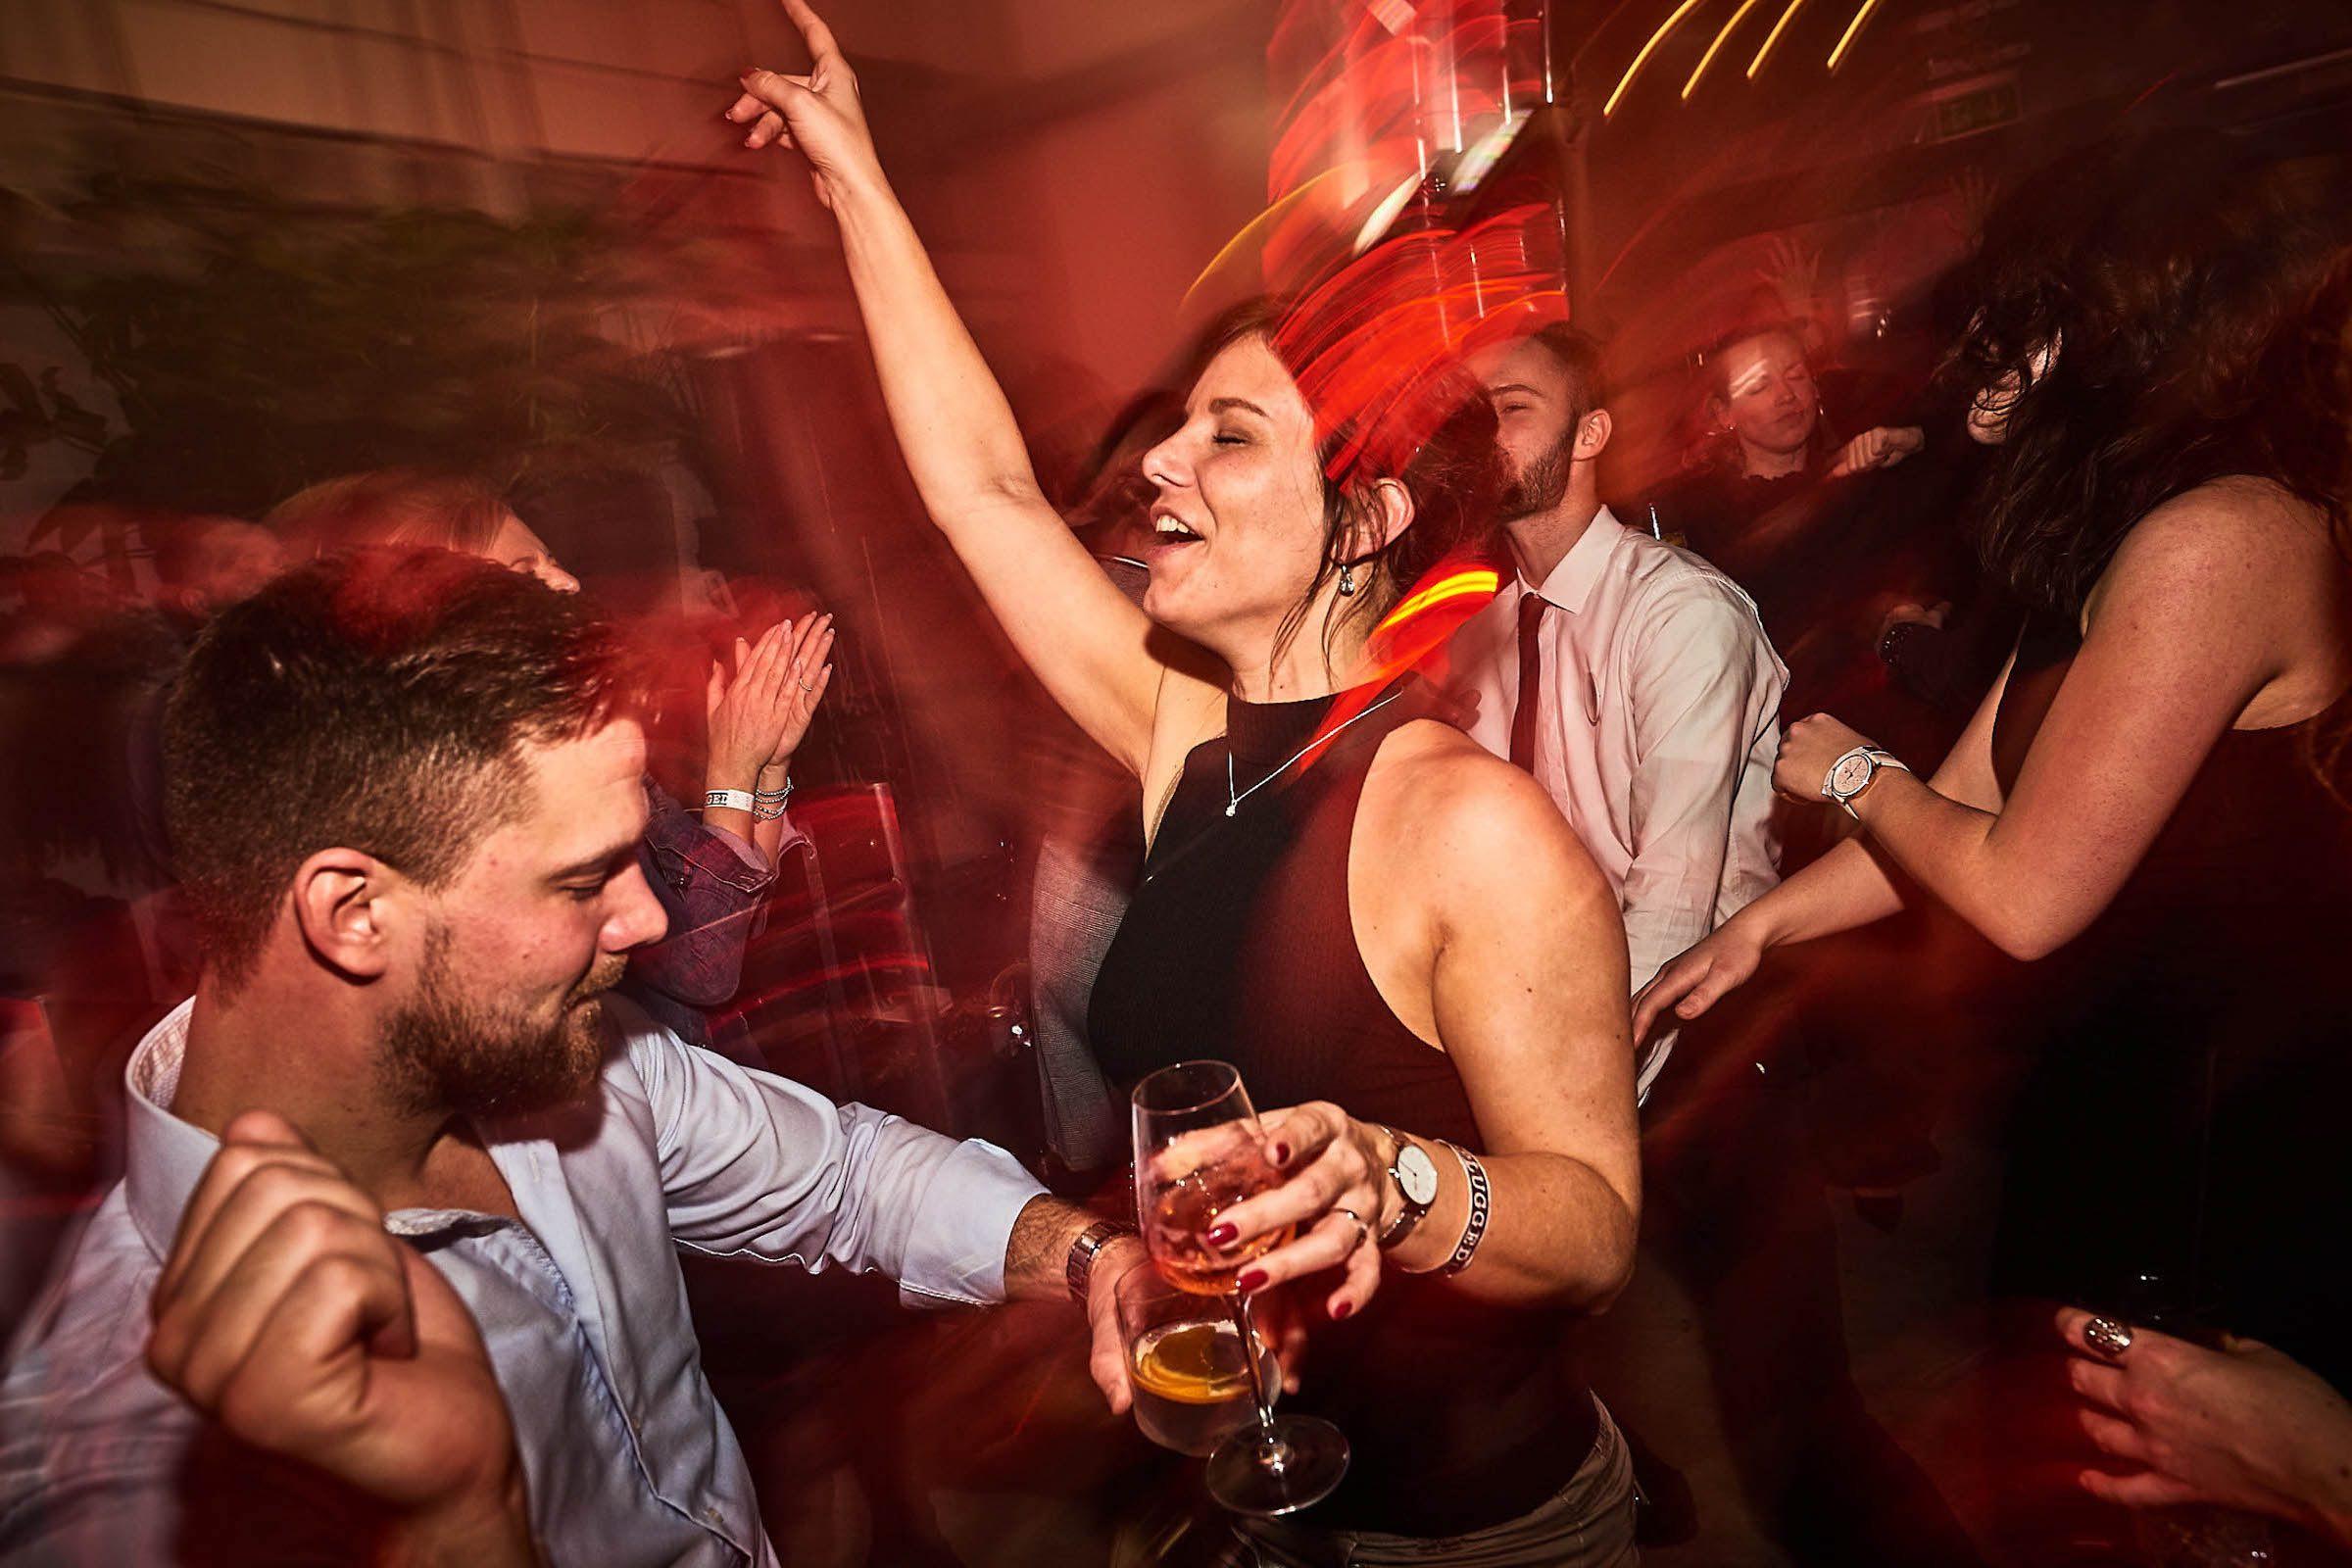 DJ | Hannover | DJ | Agentur | DJ | Service | DJ | Messe | DJ | Firmenevent | Firmenfeier | DJ | Weihnachtsfeier | DJ | Sommerfest | DJ | Weihnachtsfeier | DJ | Event | DJ | Mieten | Buchen | Anfragen | Lehmann | Eventservice